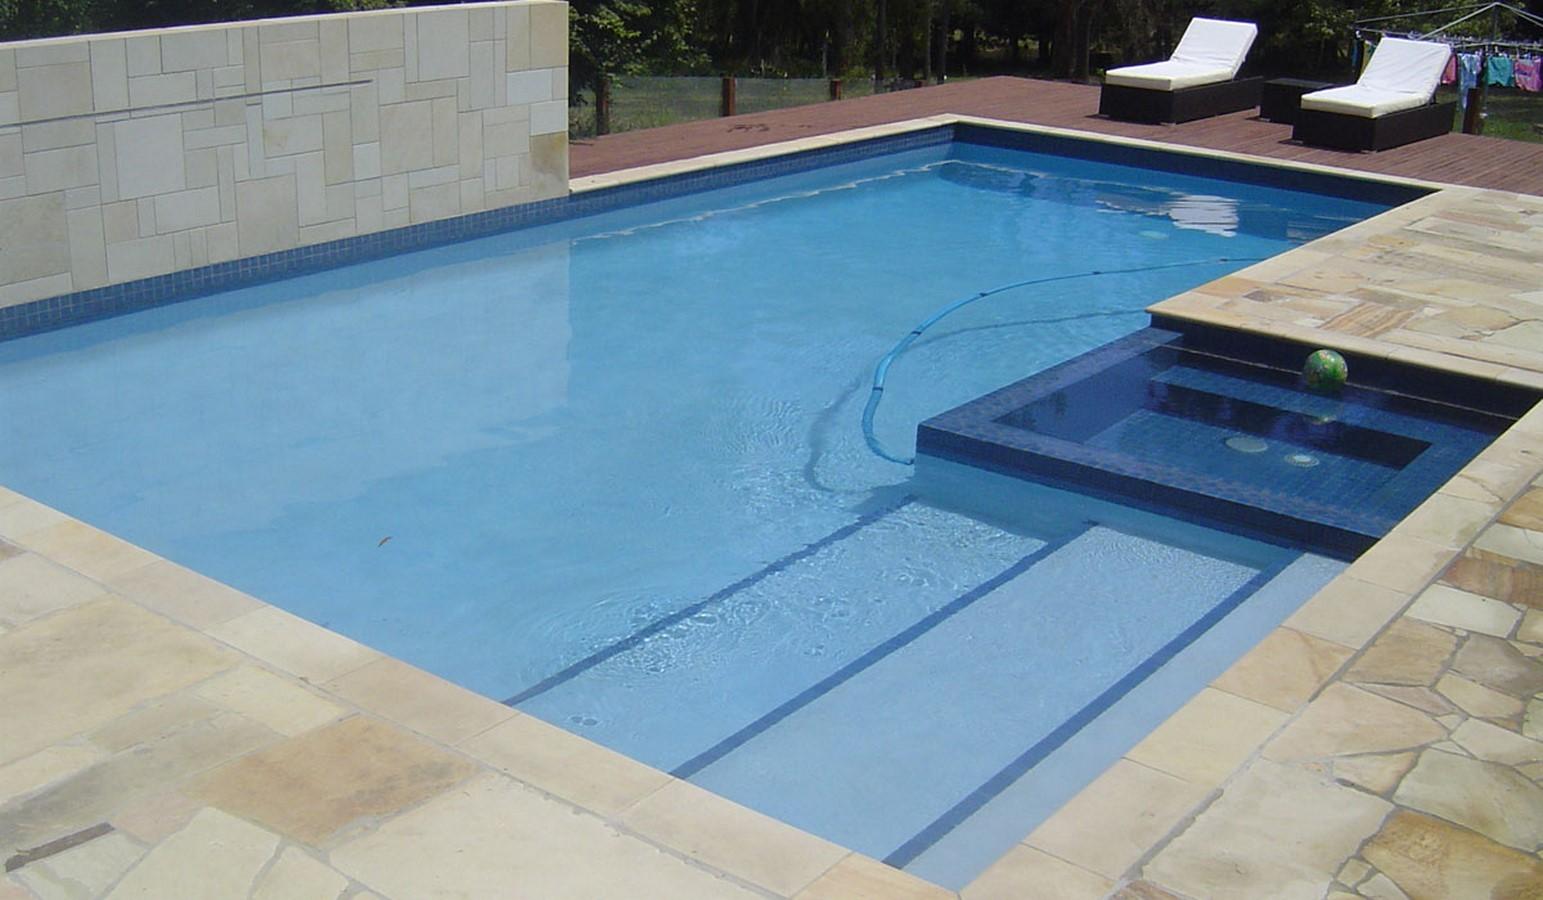 25 flooring patterns for Swimming Pools - Sheet37